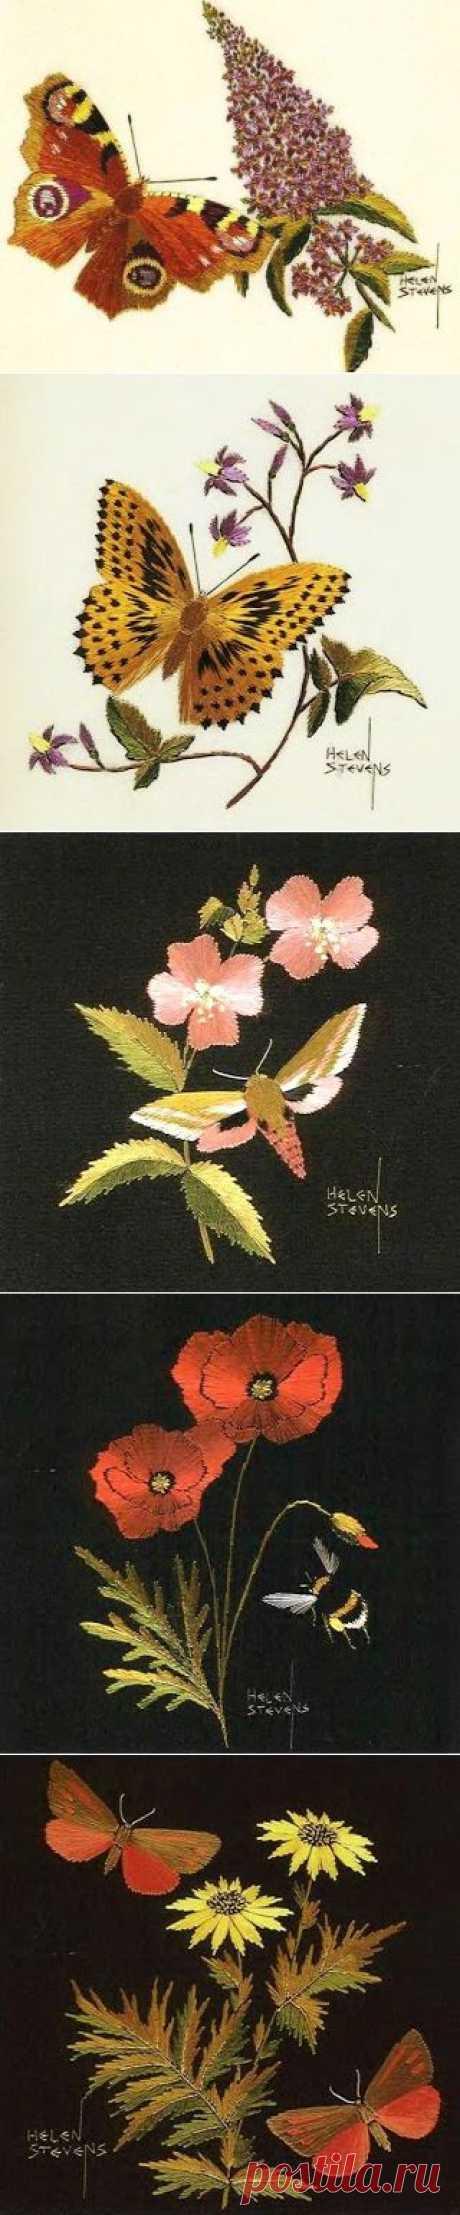 Великолепная гладь от Helen M. Stevens (ч.2): цветы, бабочки и шмели